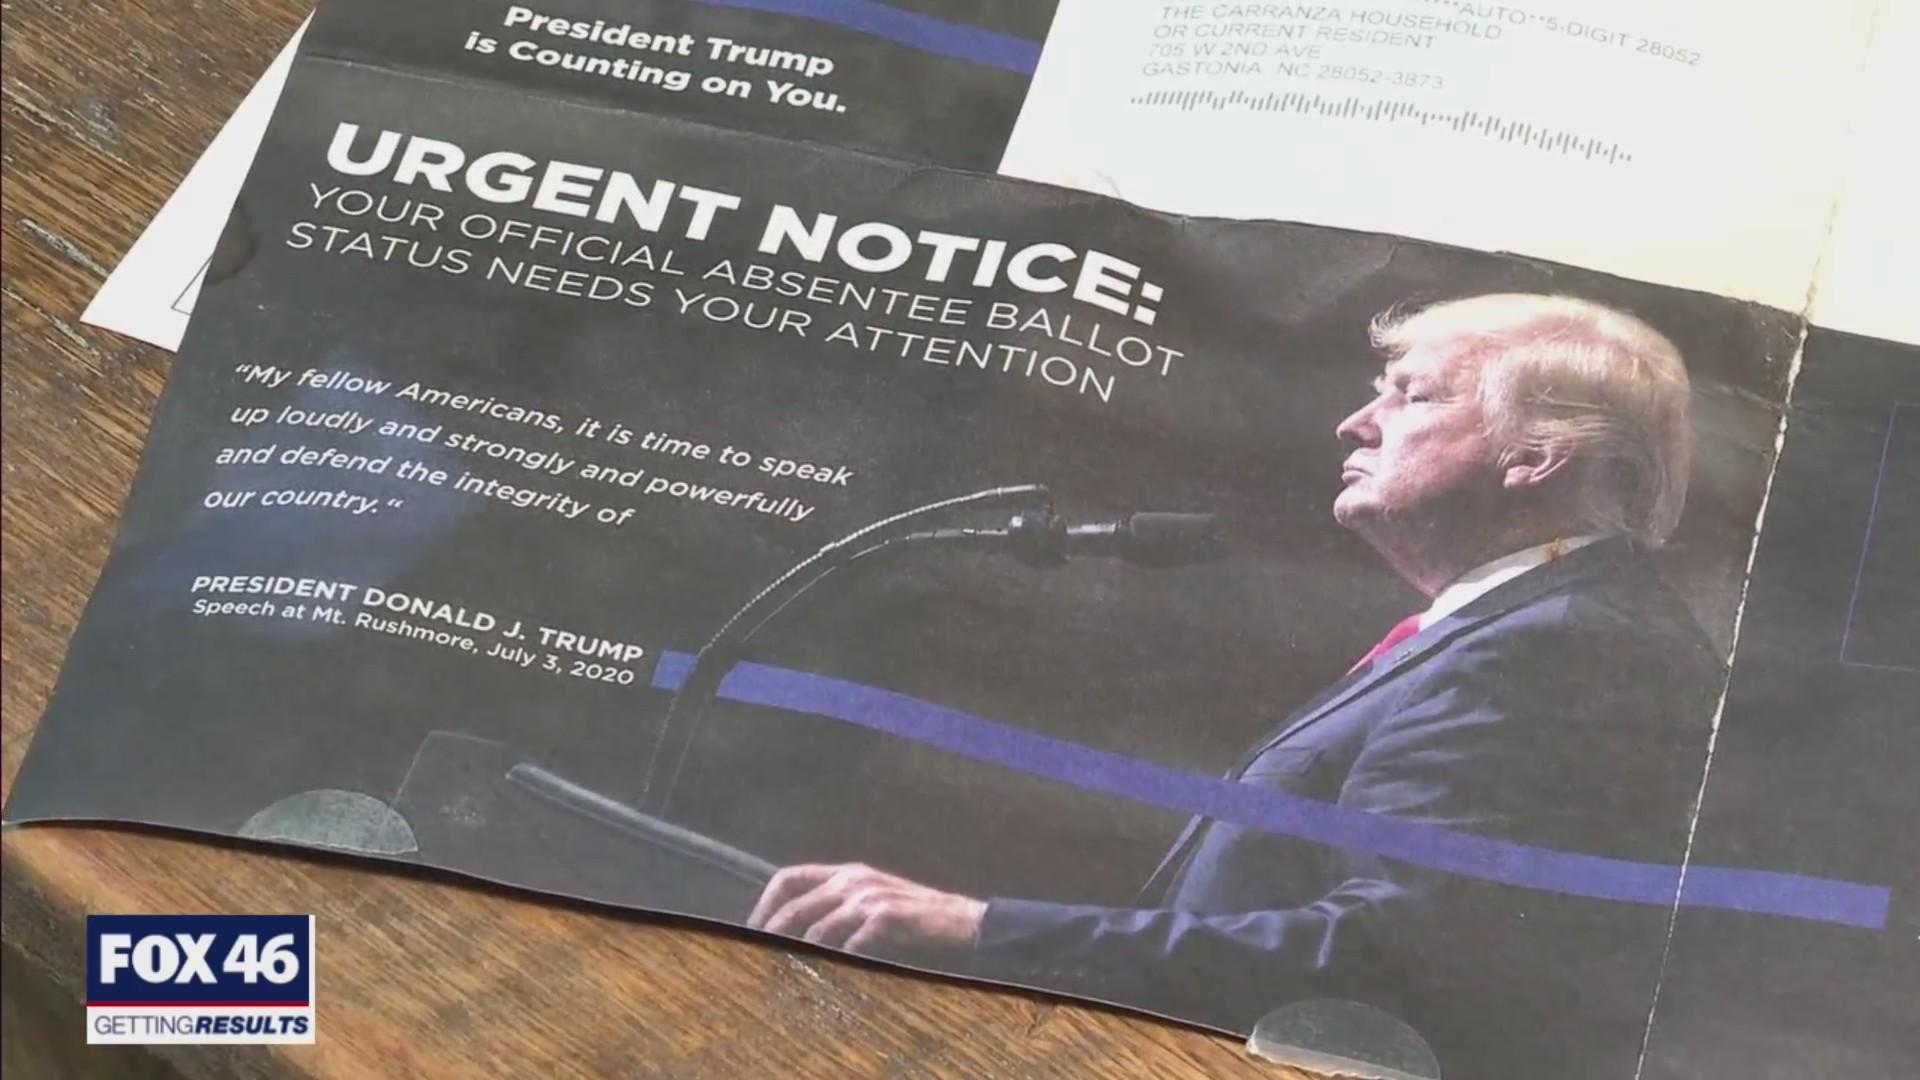 Trump puts his face on ballots